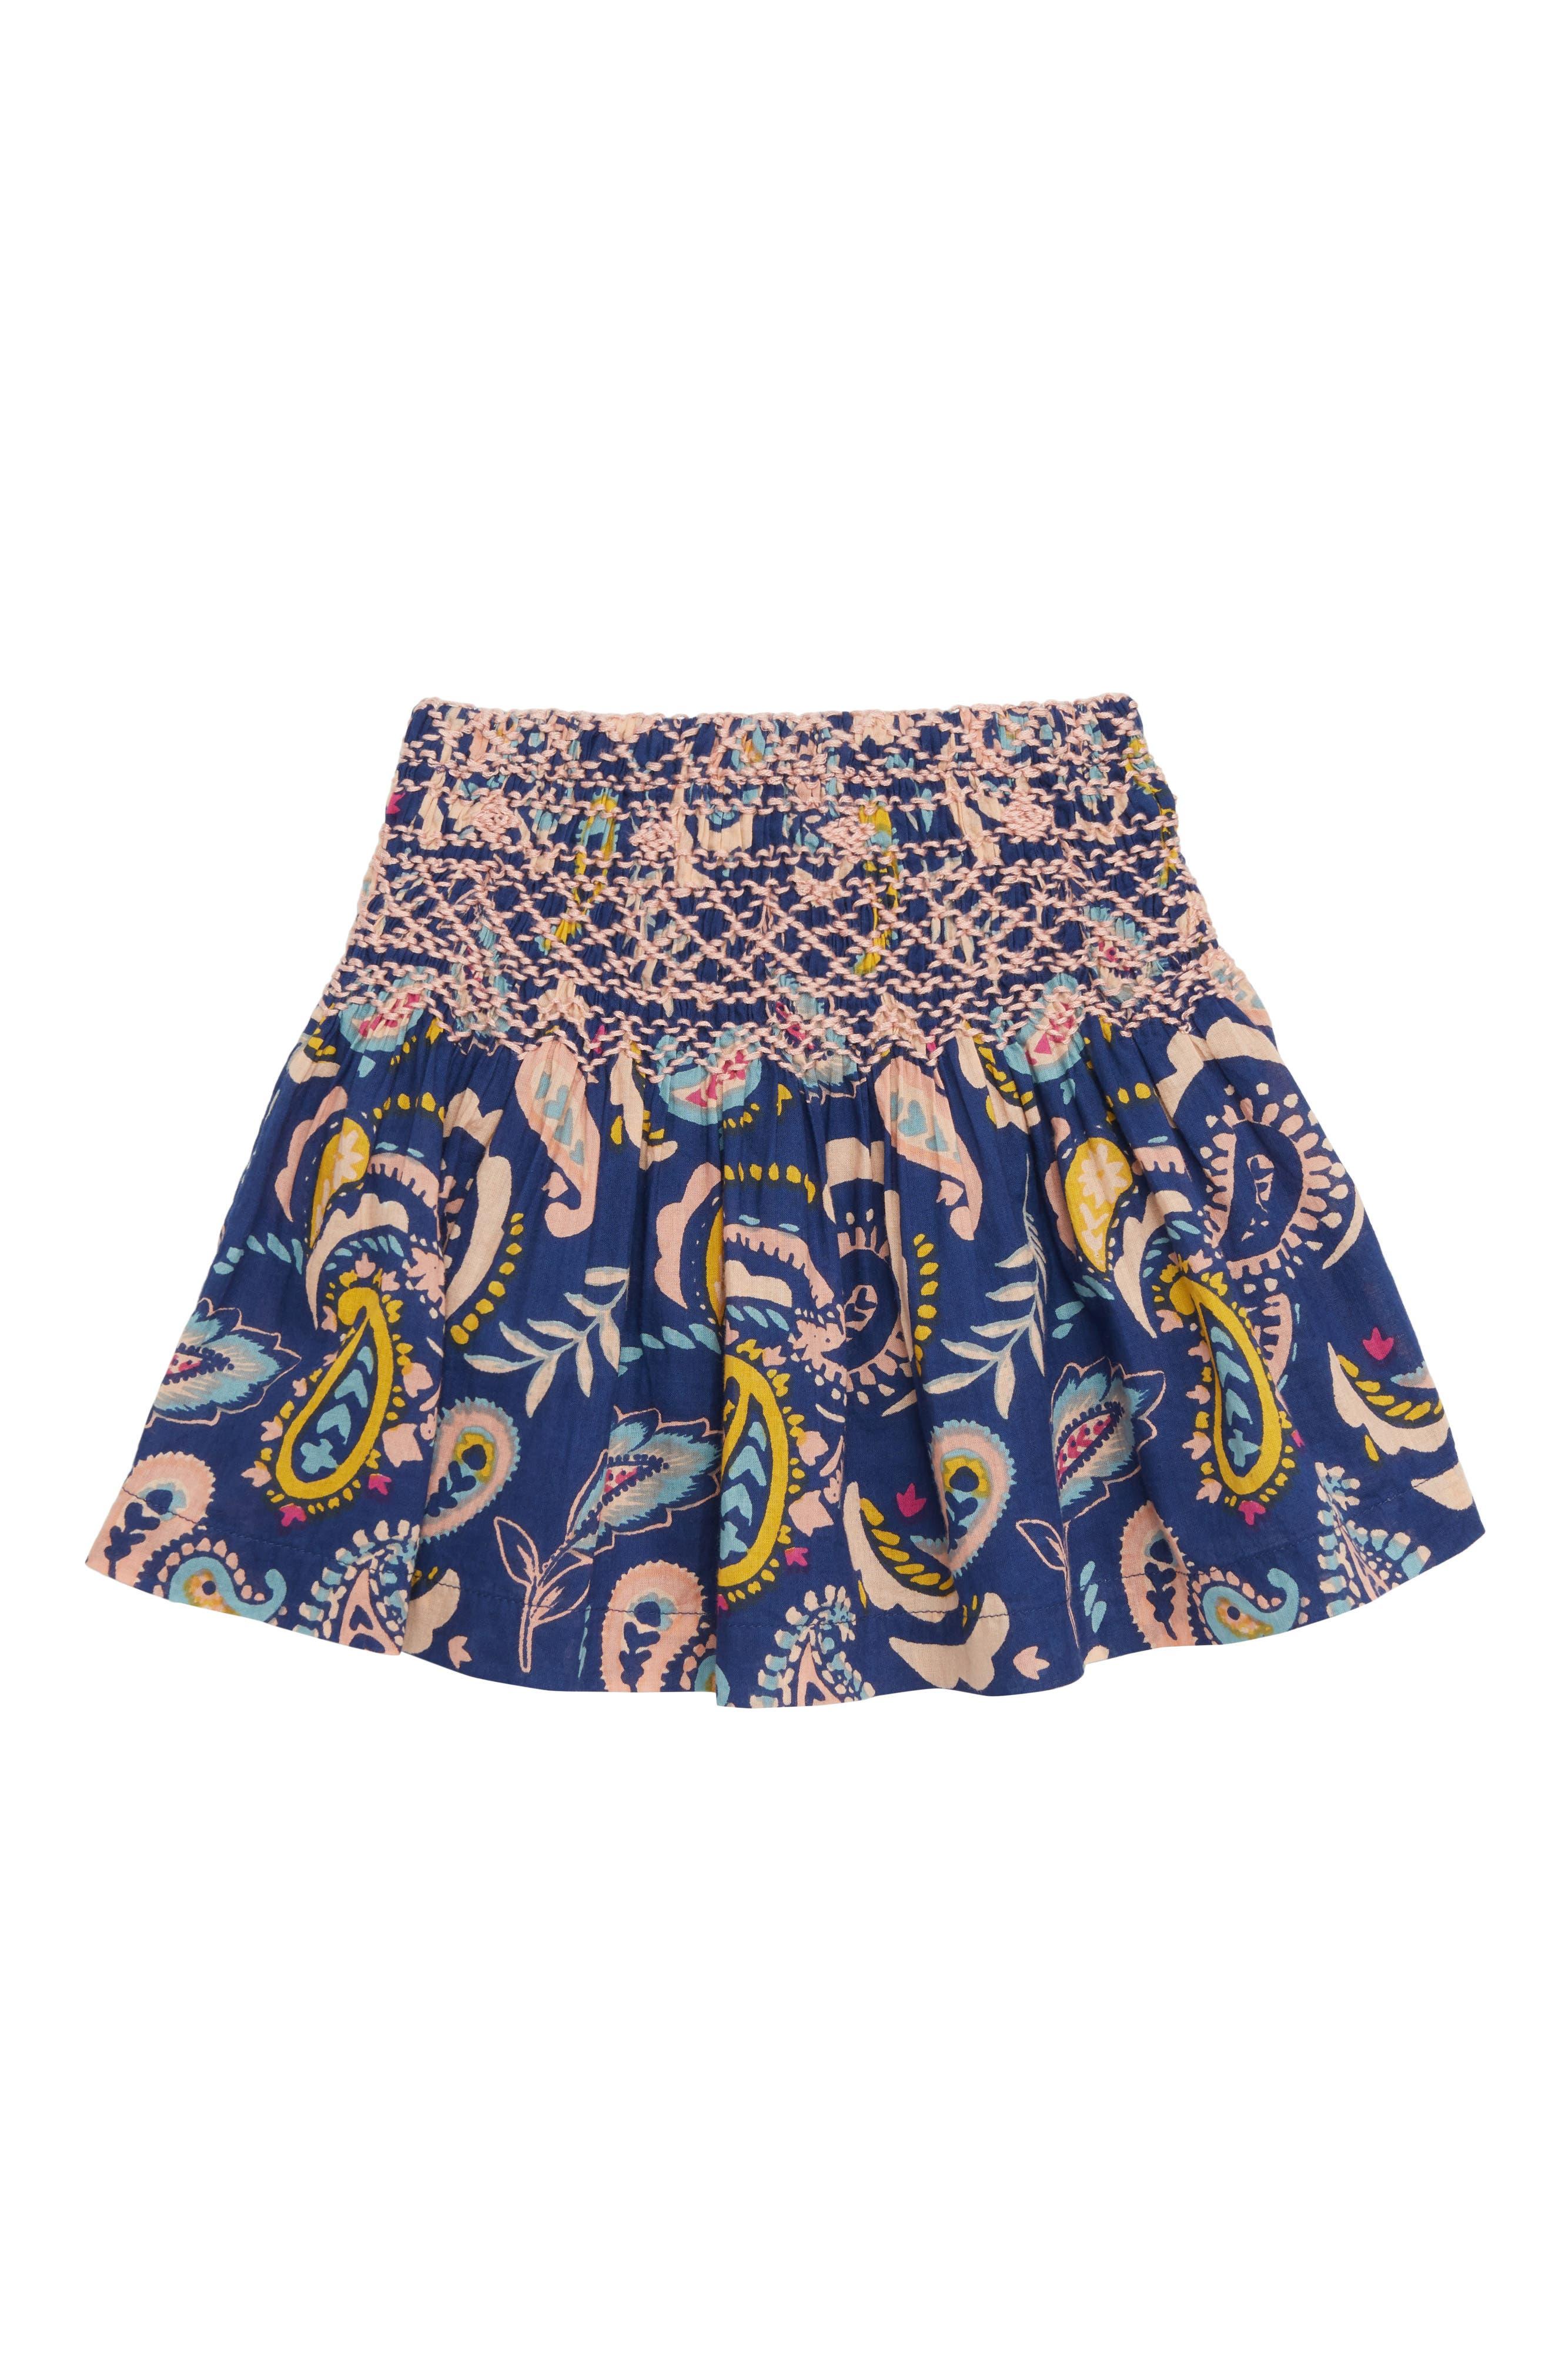 Pixie Skirt,                             Main thumbnail 1, color,                             BLUE